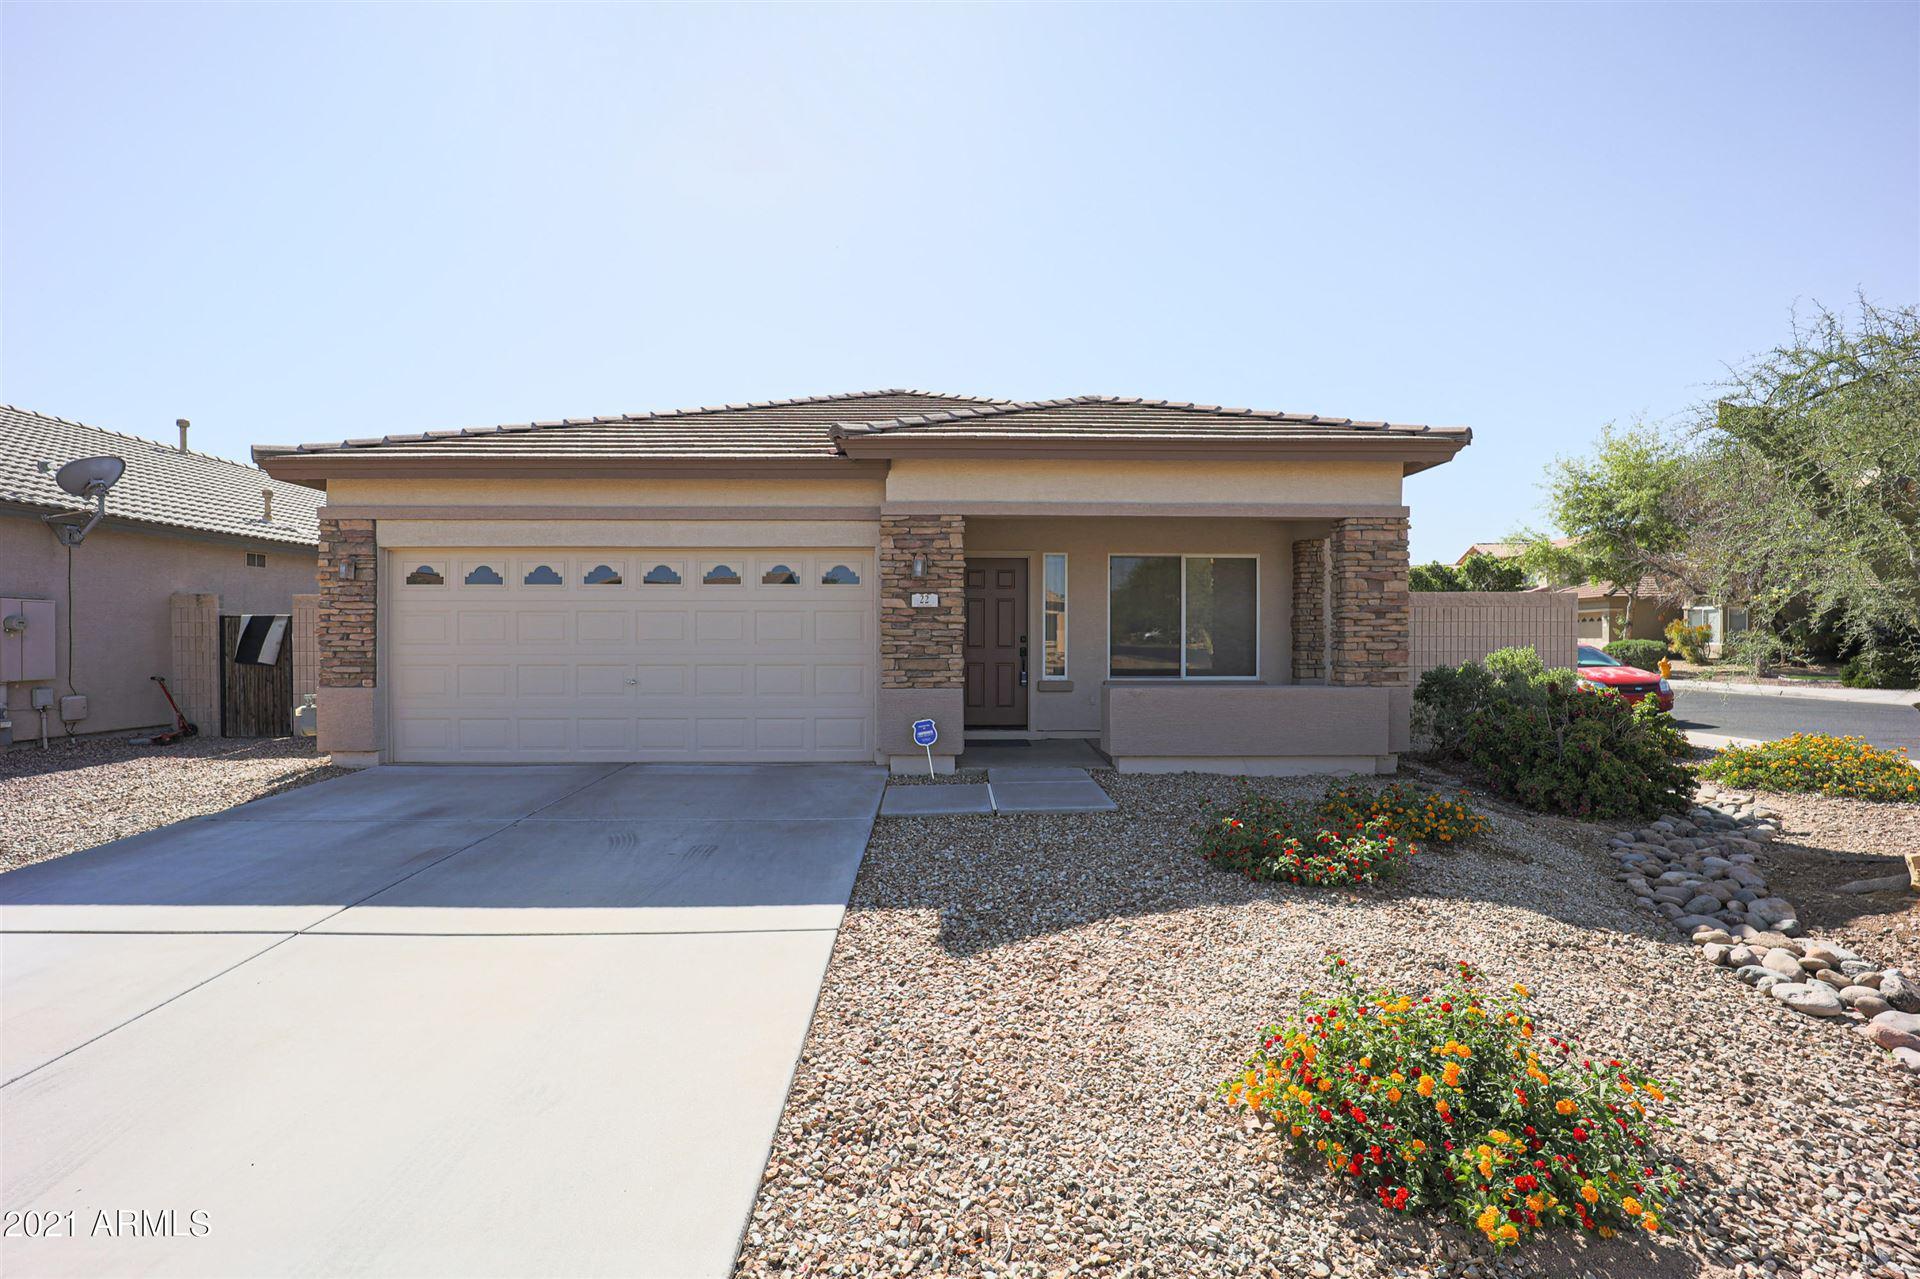 22 N 124TH Avenue, Avondale, AZ 85323 - MLS#: 6224370